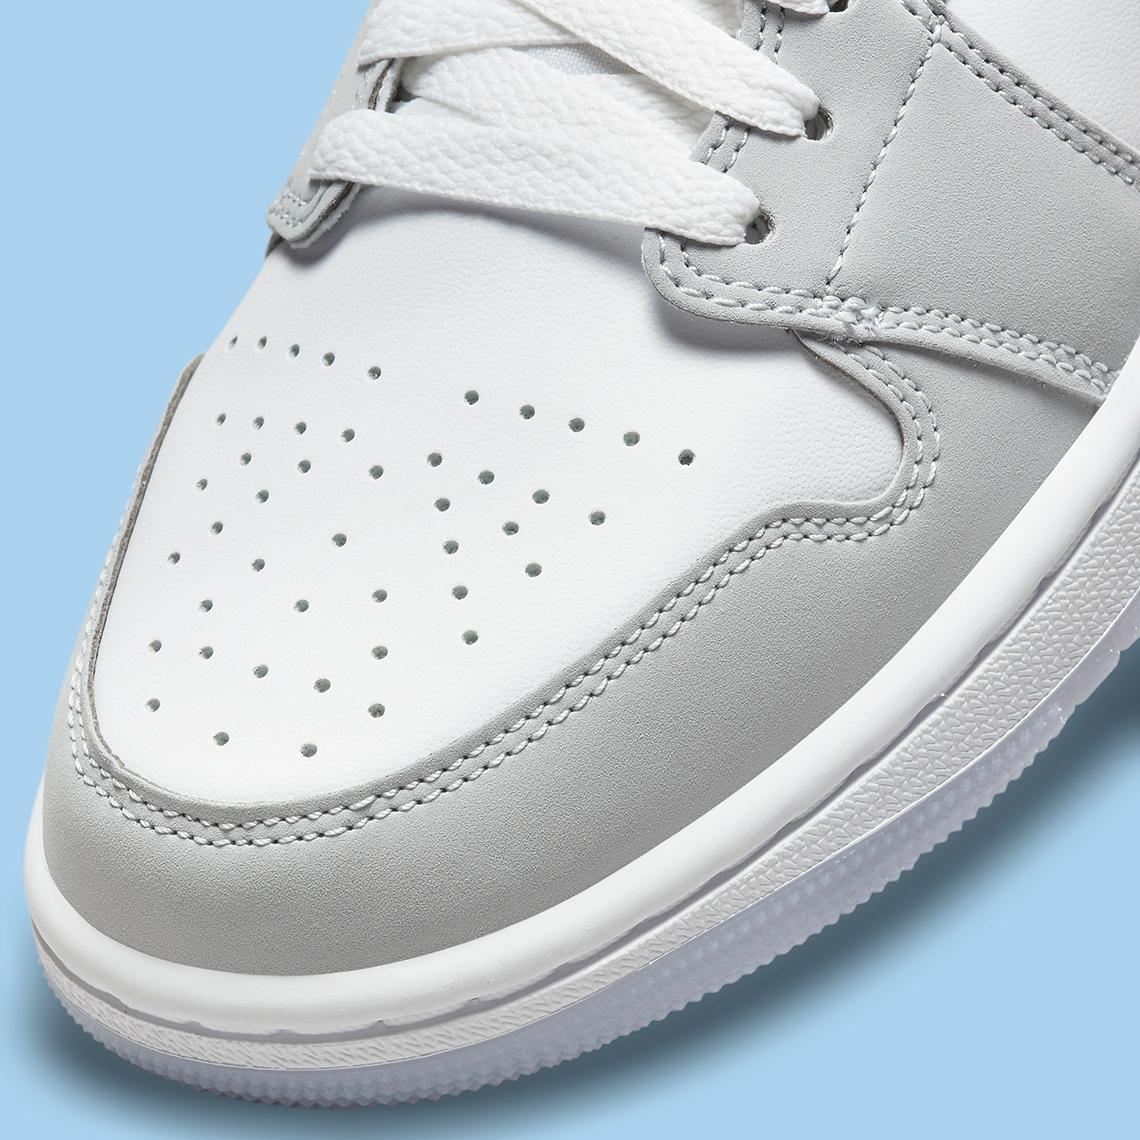 Air Jordan 1 Mid WMNS ''Grey Blue'' - BQ6472-105